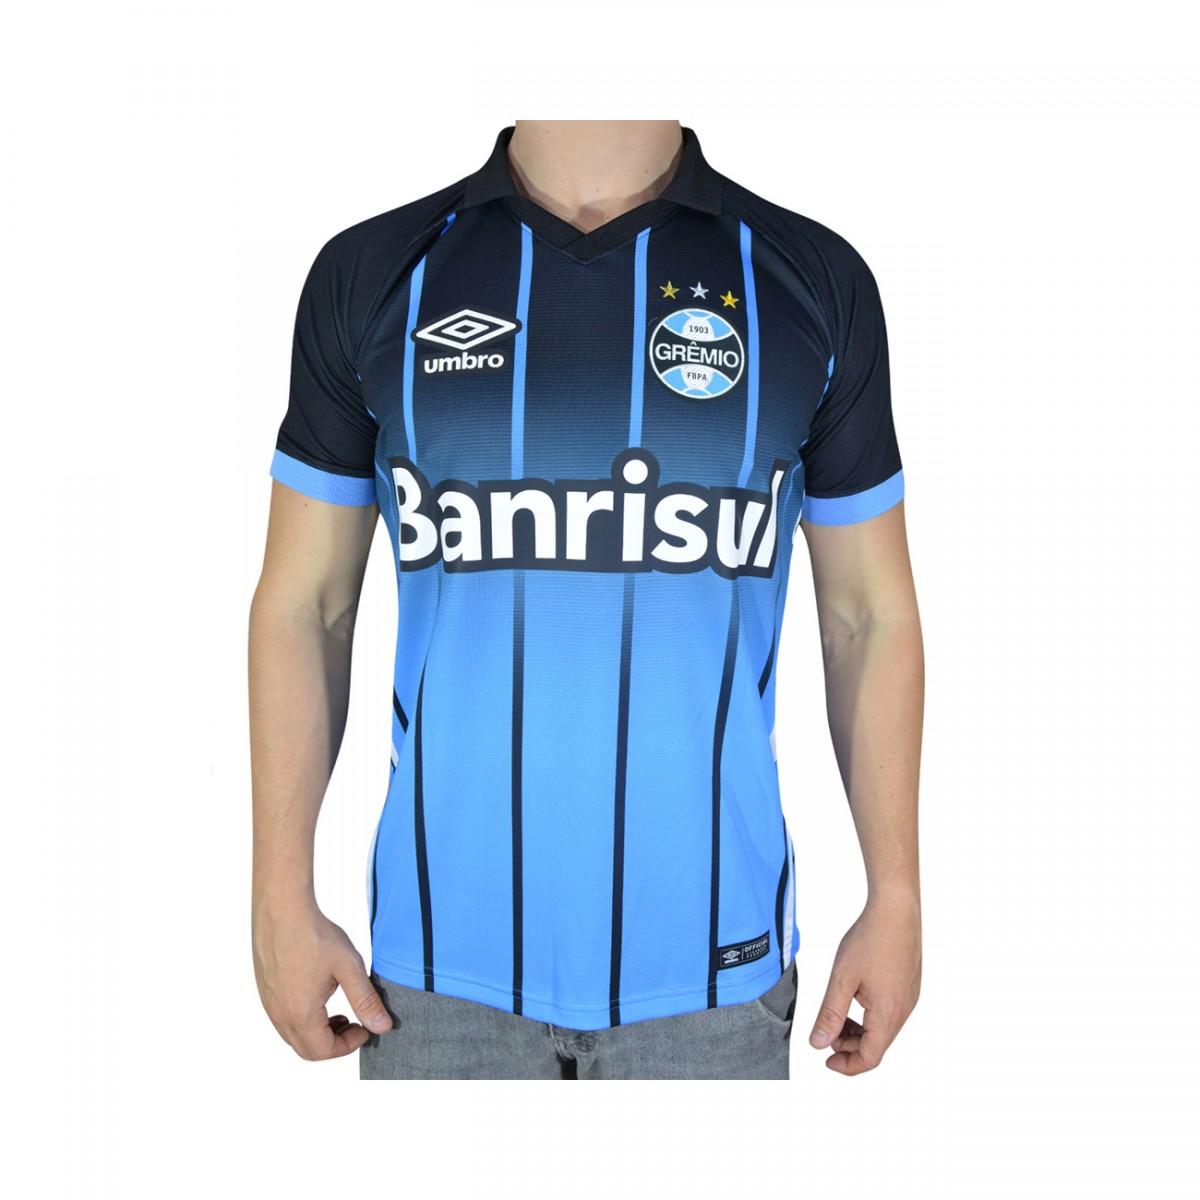 1dce6177cf601 Camisa Gremio Umbro 3 2016 Juvenil 696182 - Preto Azul Celeste Branco -  Chuteira Nike